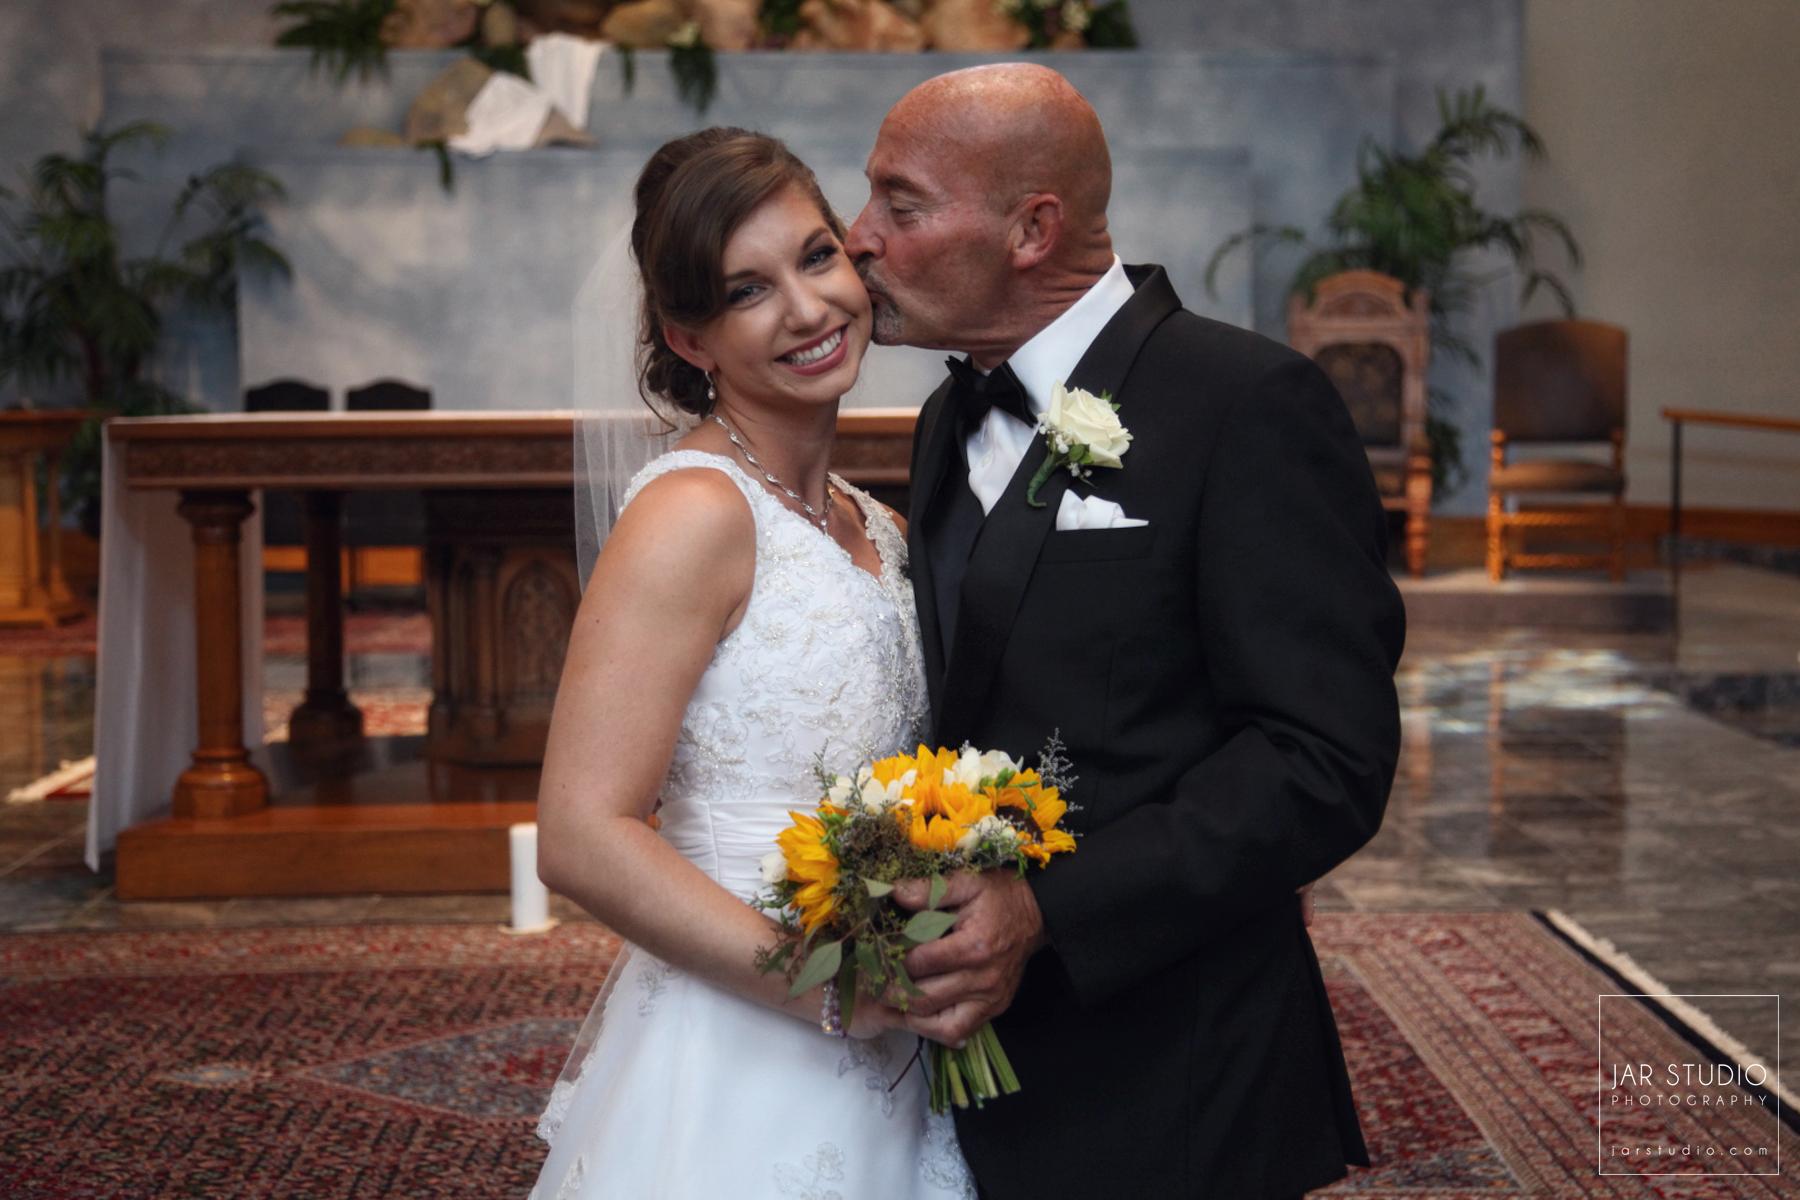 09-father-of-the-happy-bride-jarstudio-photography-orlando.JPG